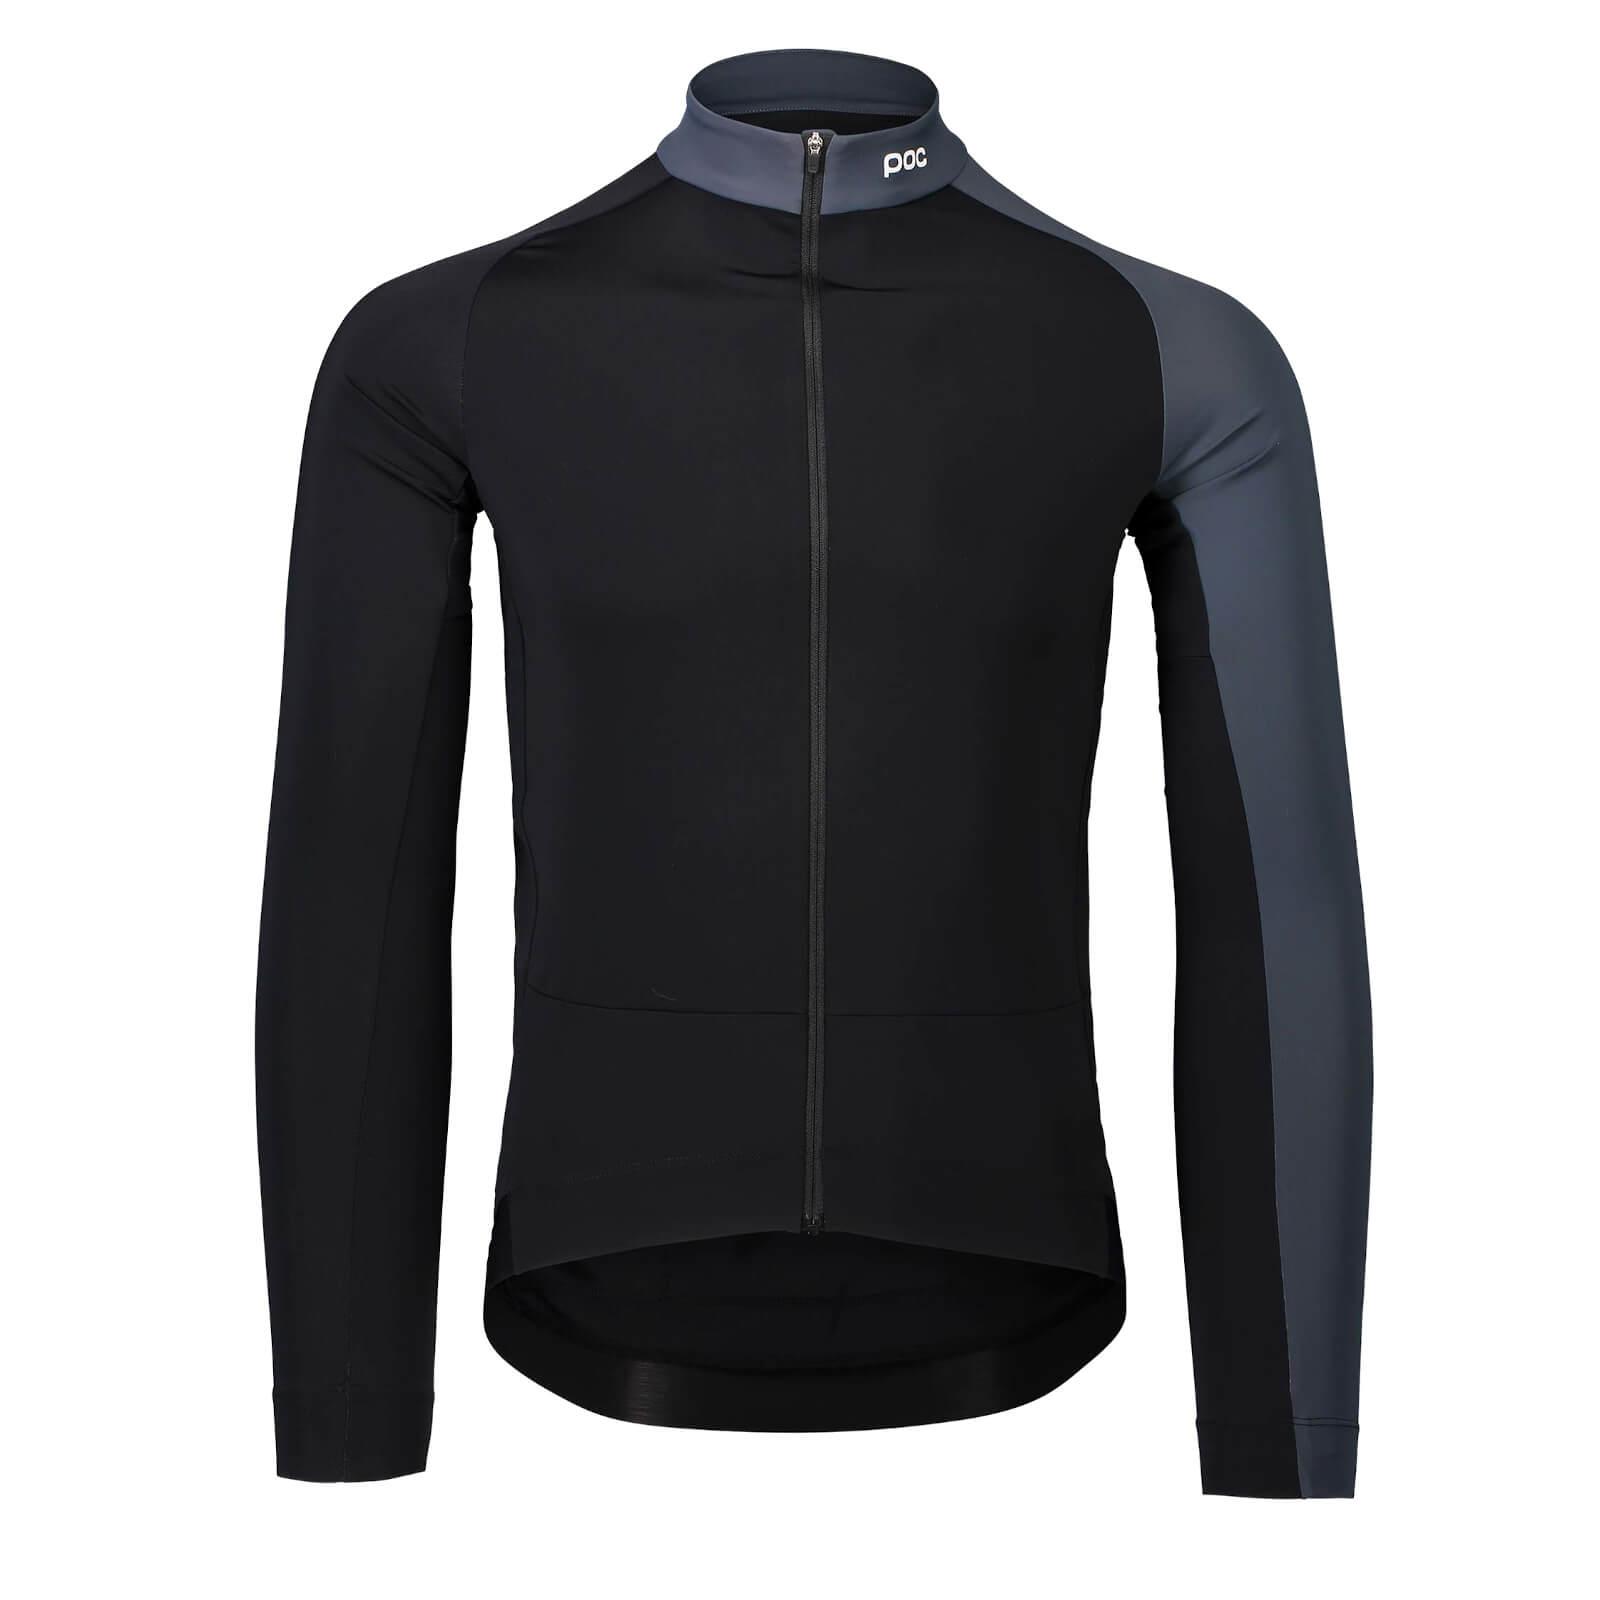 POC Essential Mid Long Sleeve Jersey - XL - Uranium Black/Sylvanite Grey